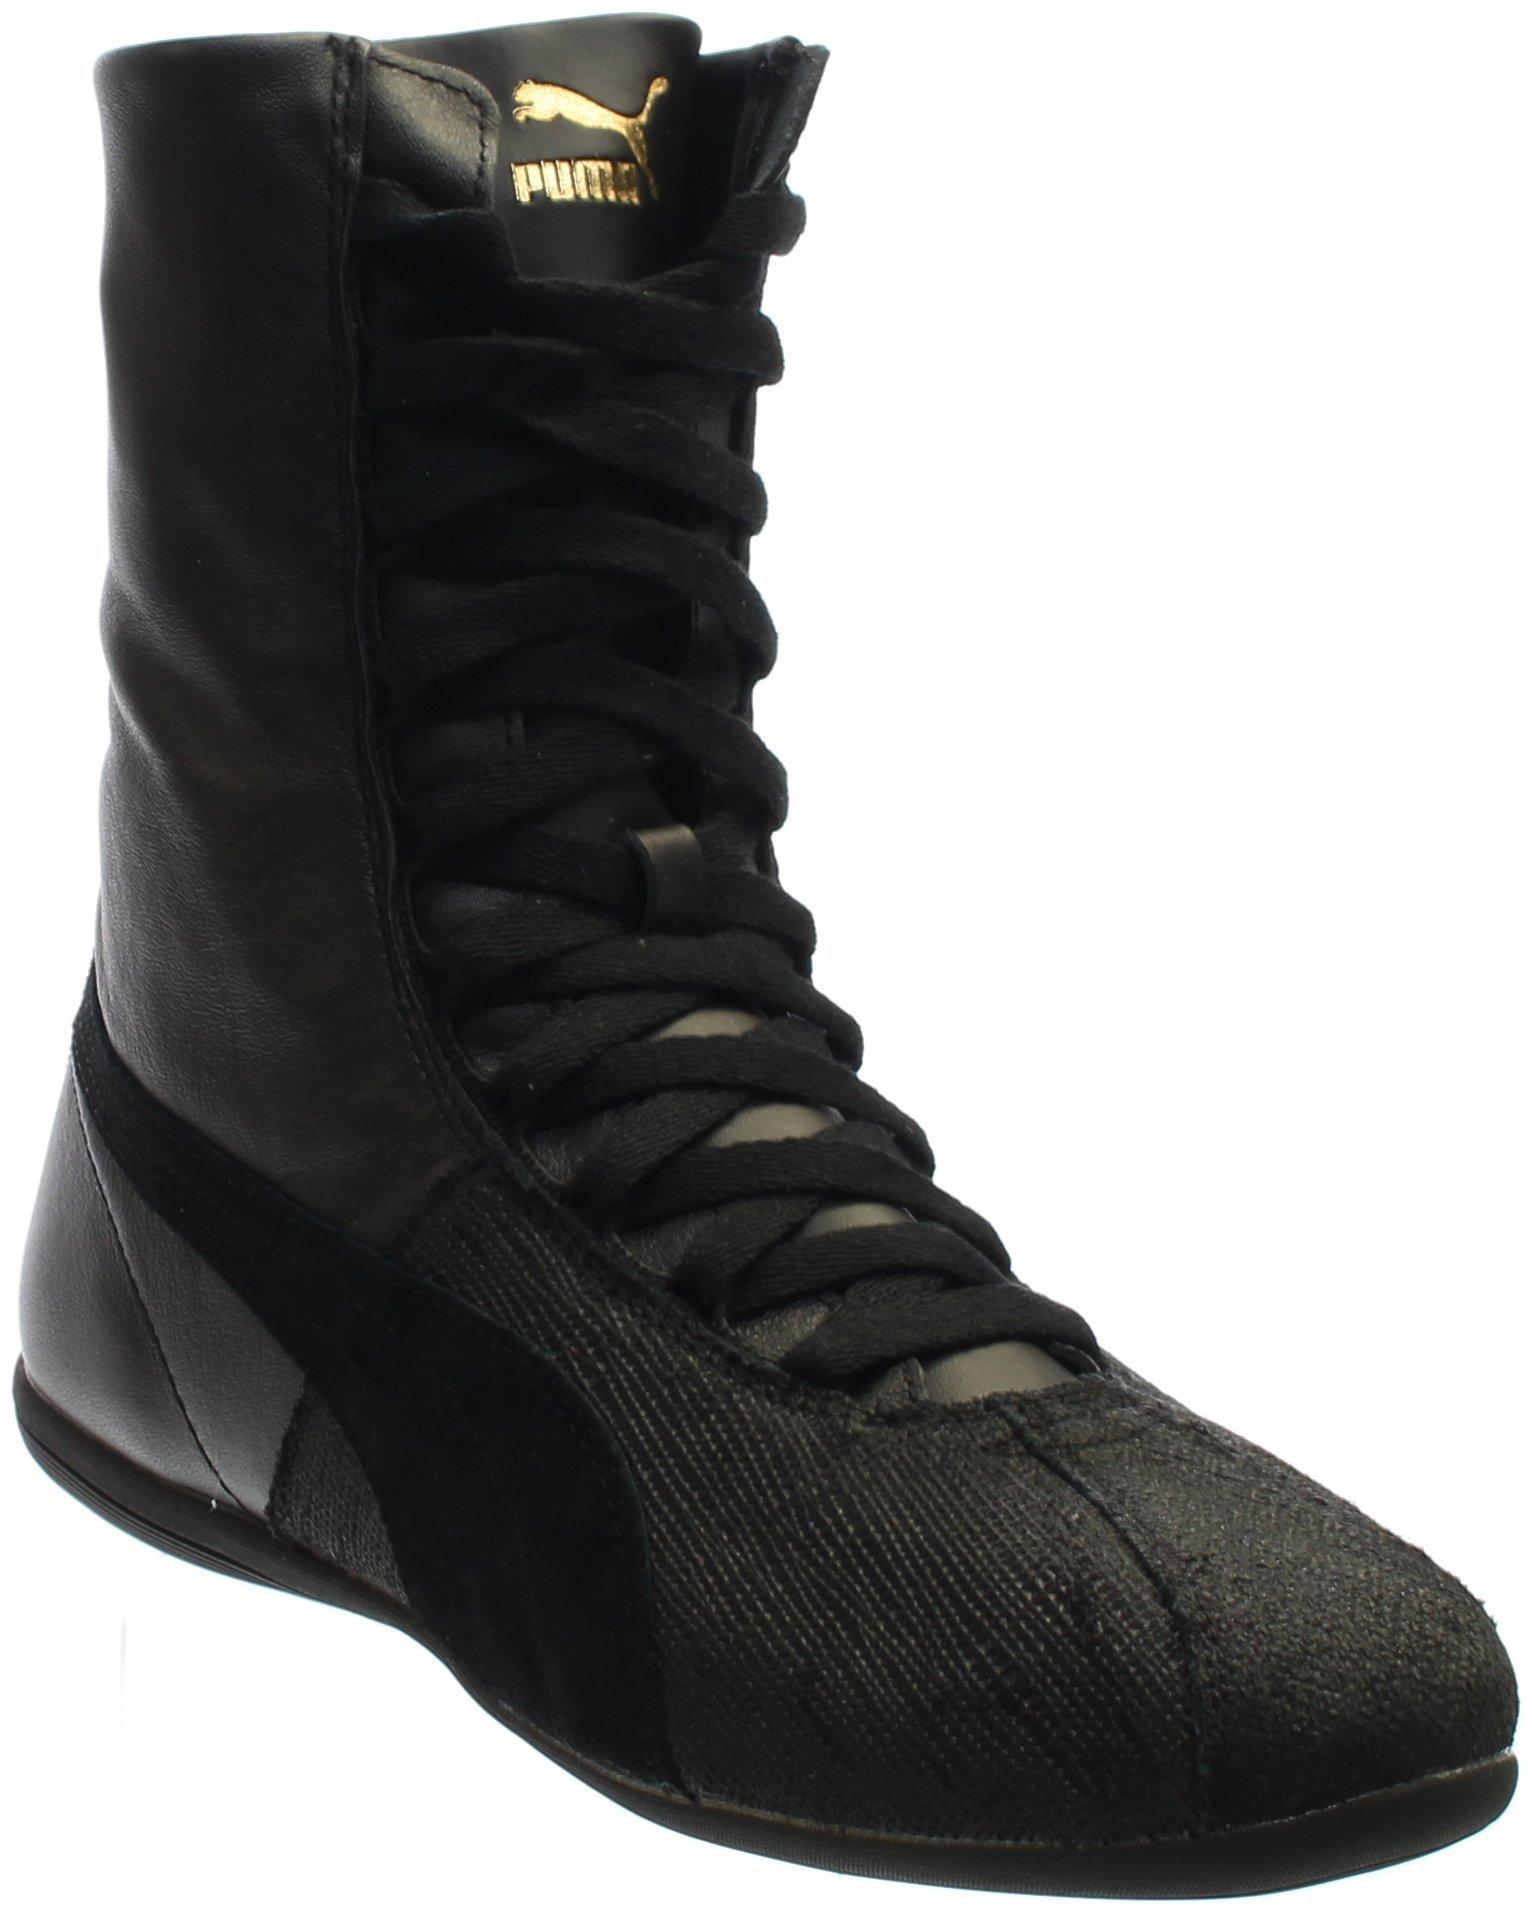 PUMA Women's Eskiva High Remaster Black Black Sneaker 8.5 B (M)